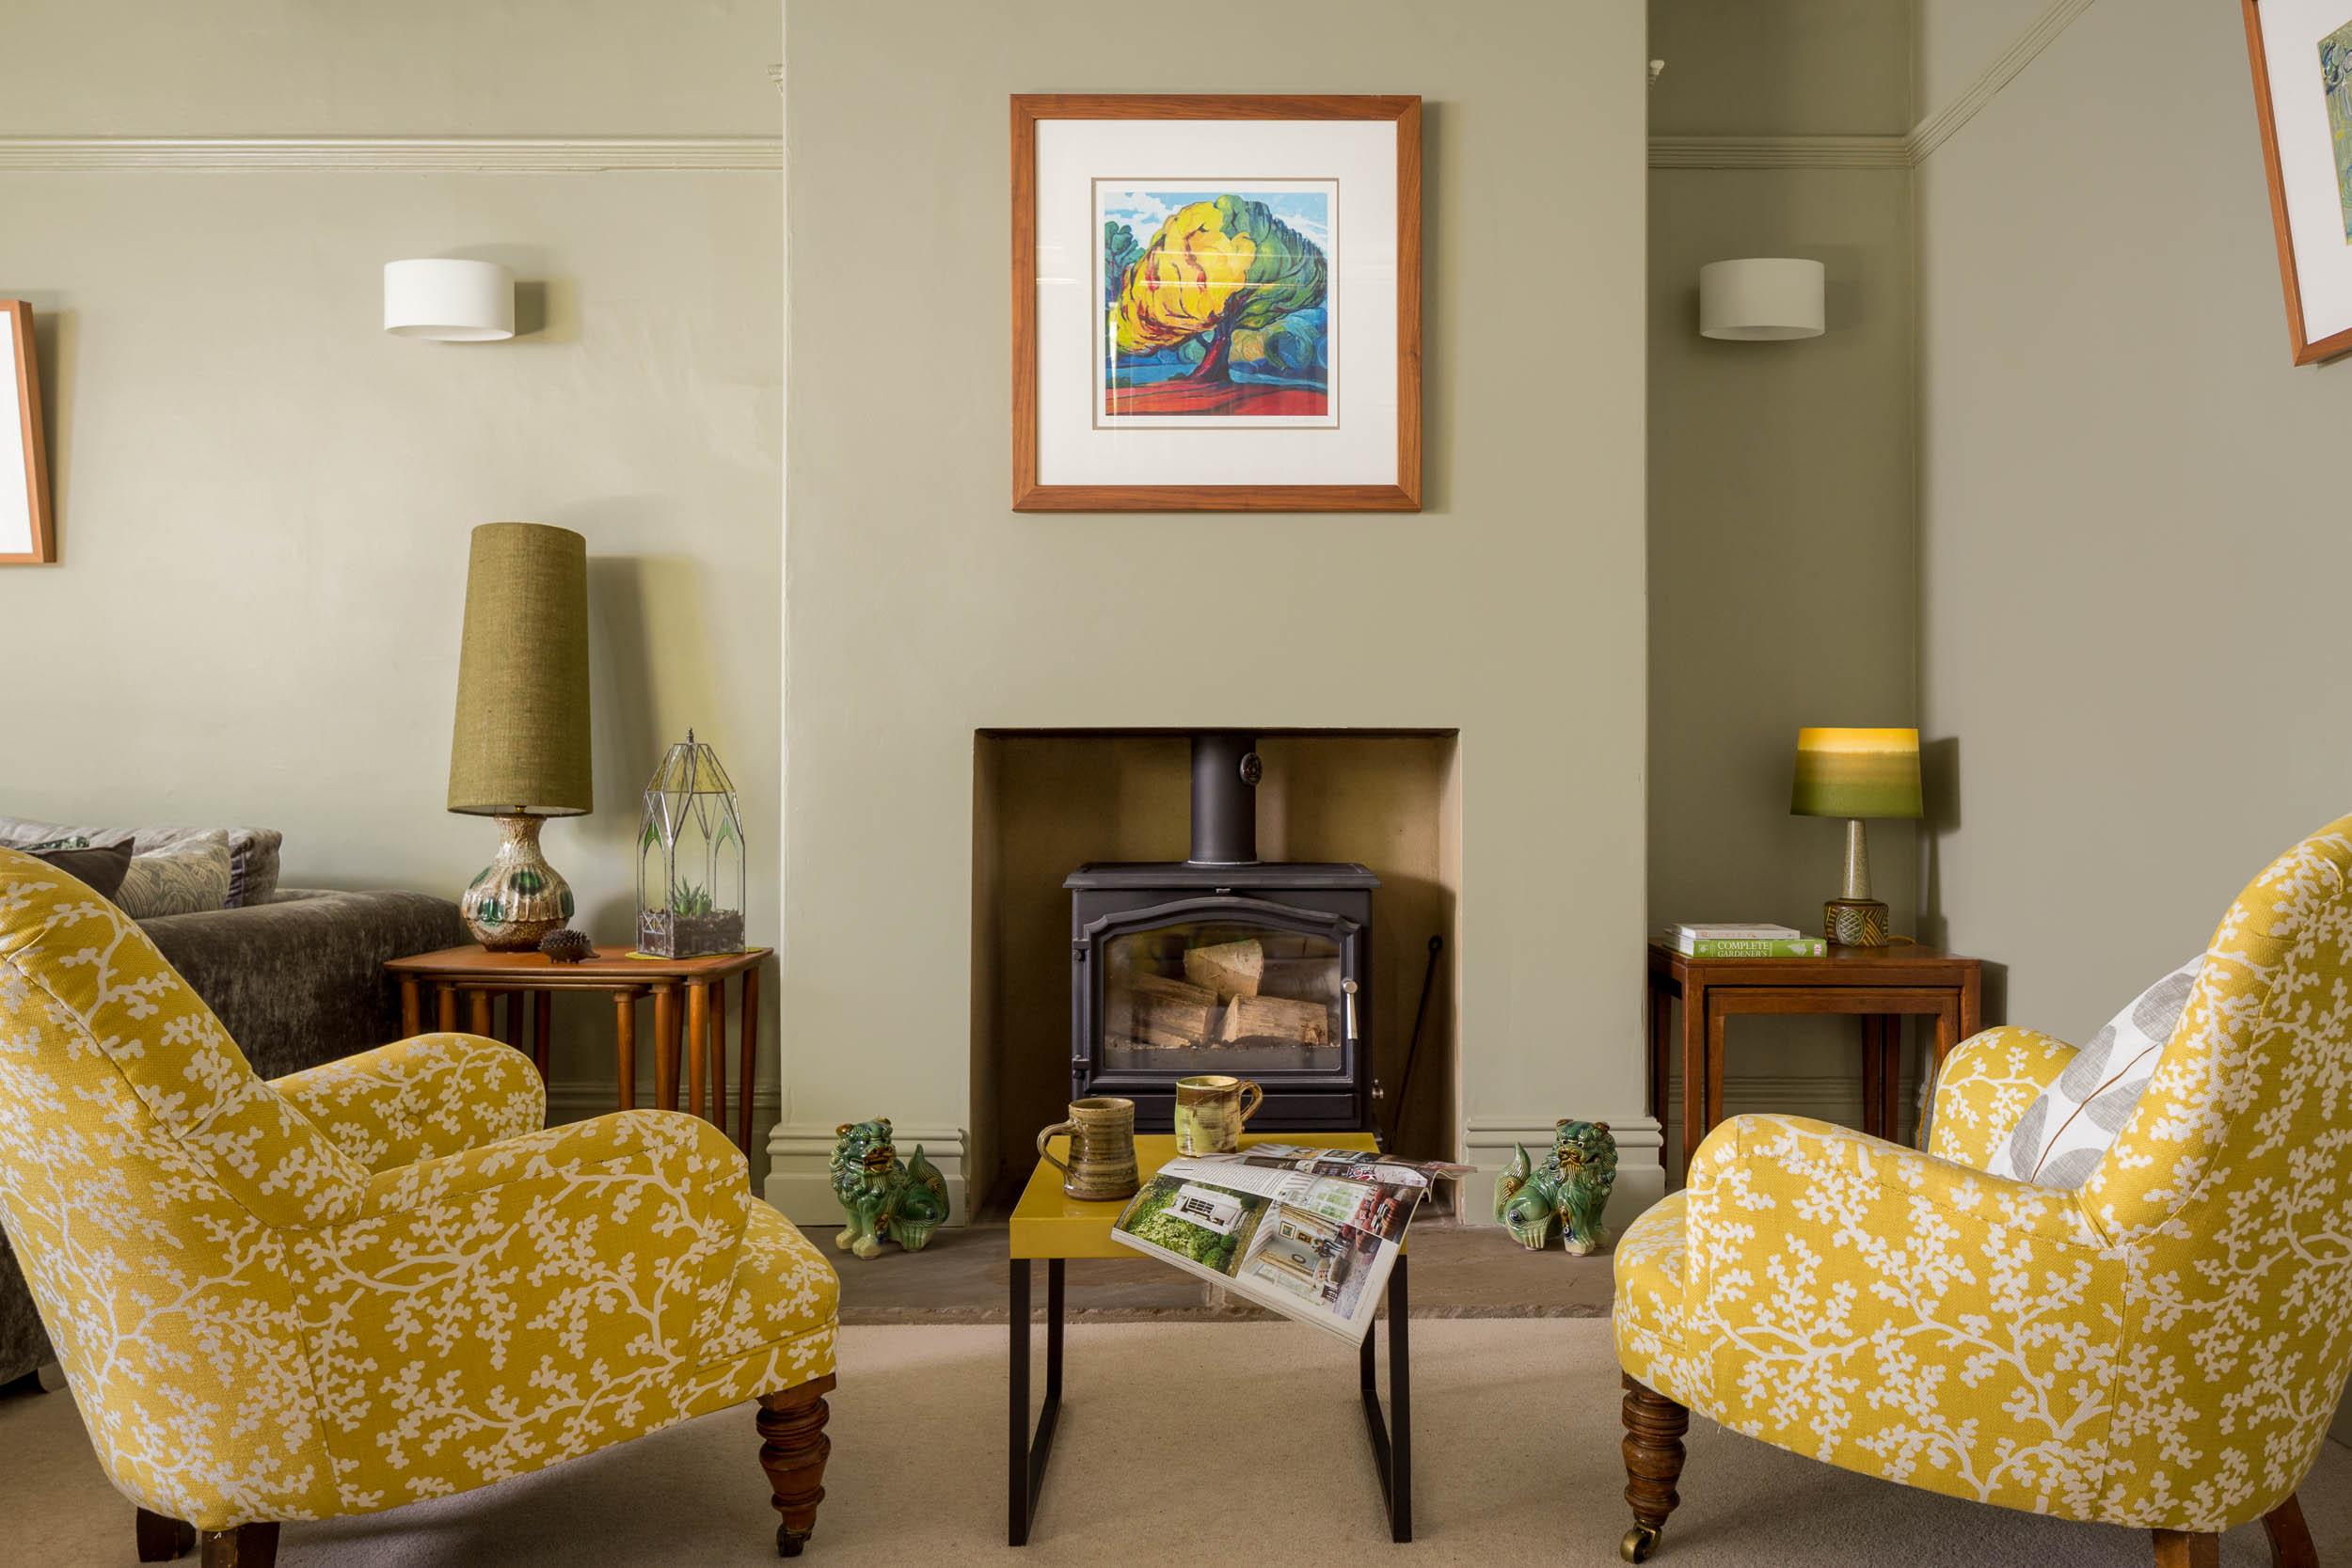 living room interior design fireplace detail leeds.jpg